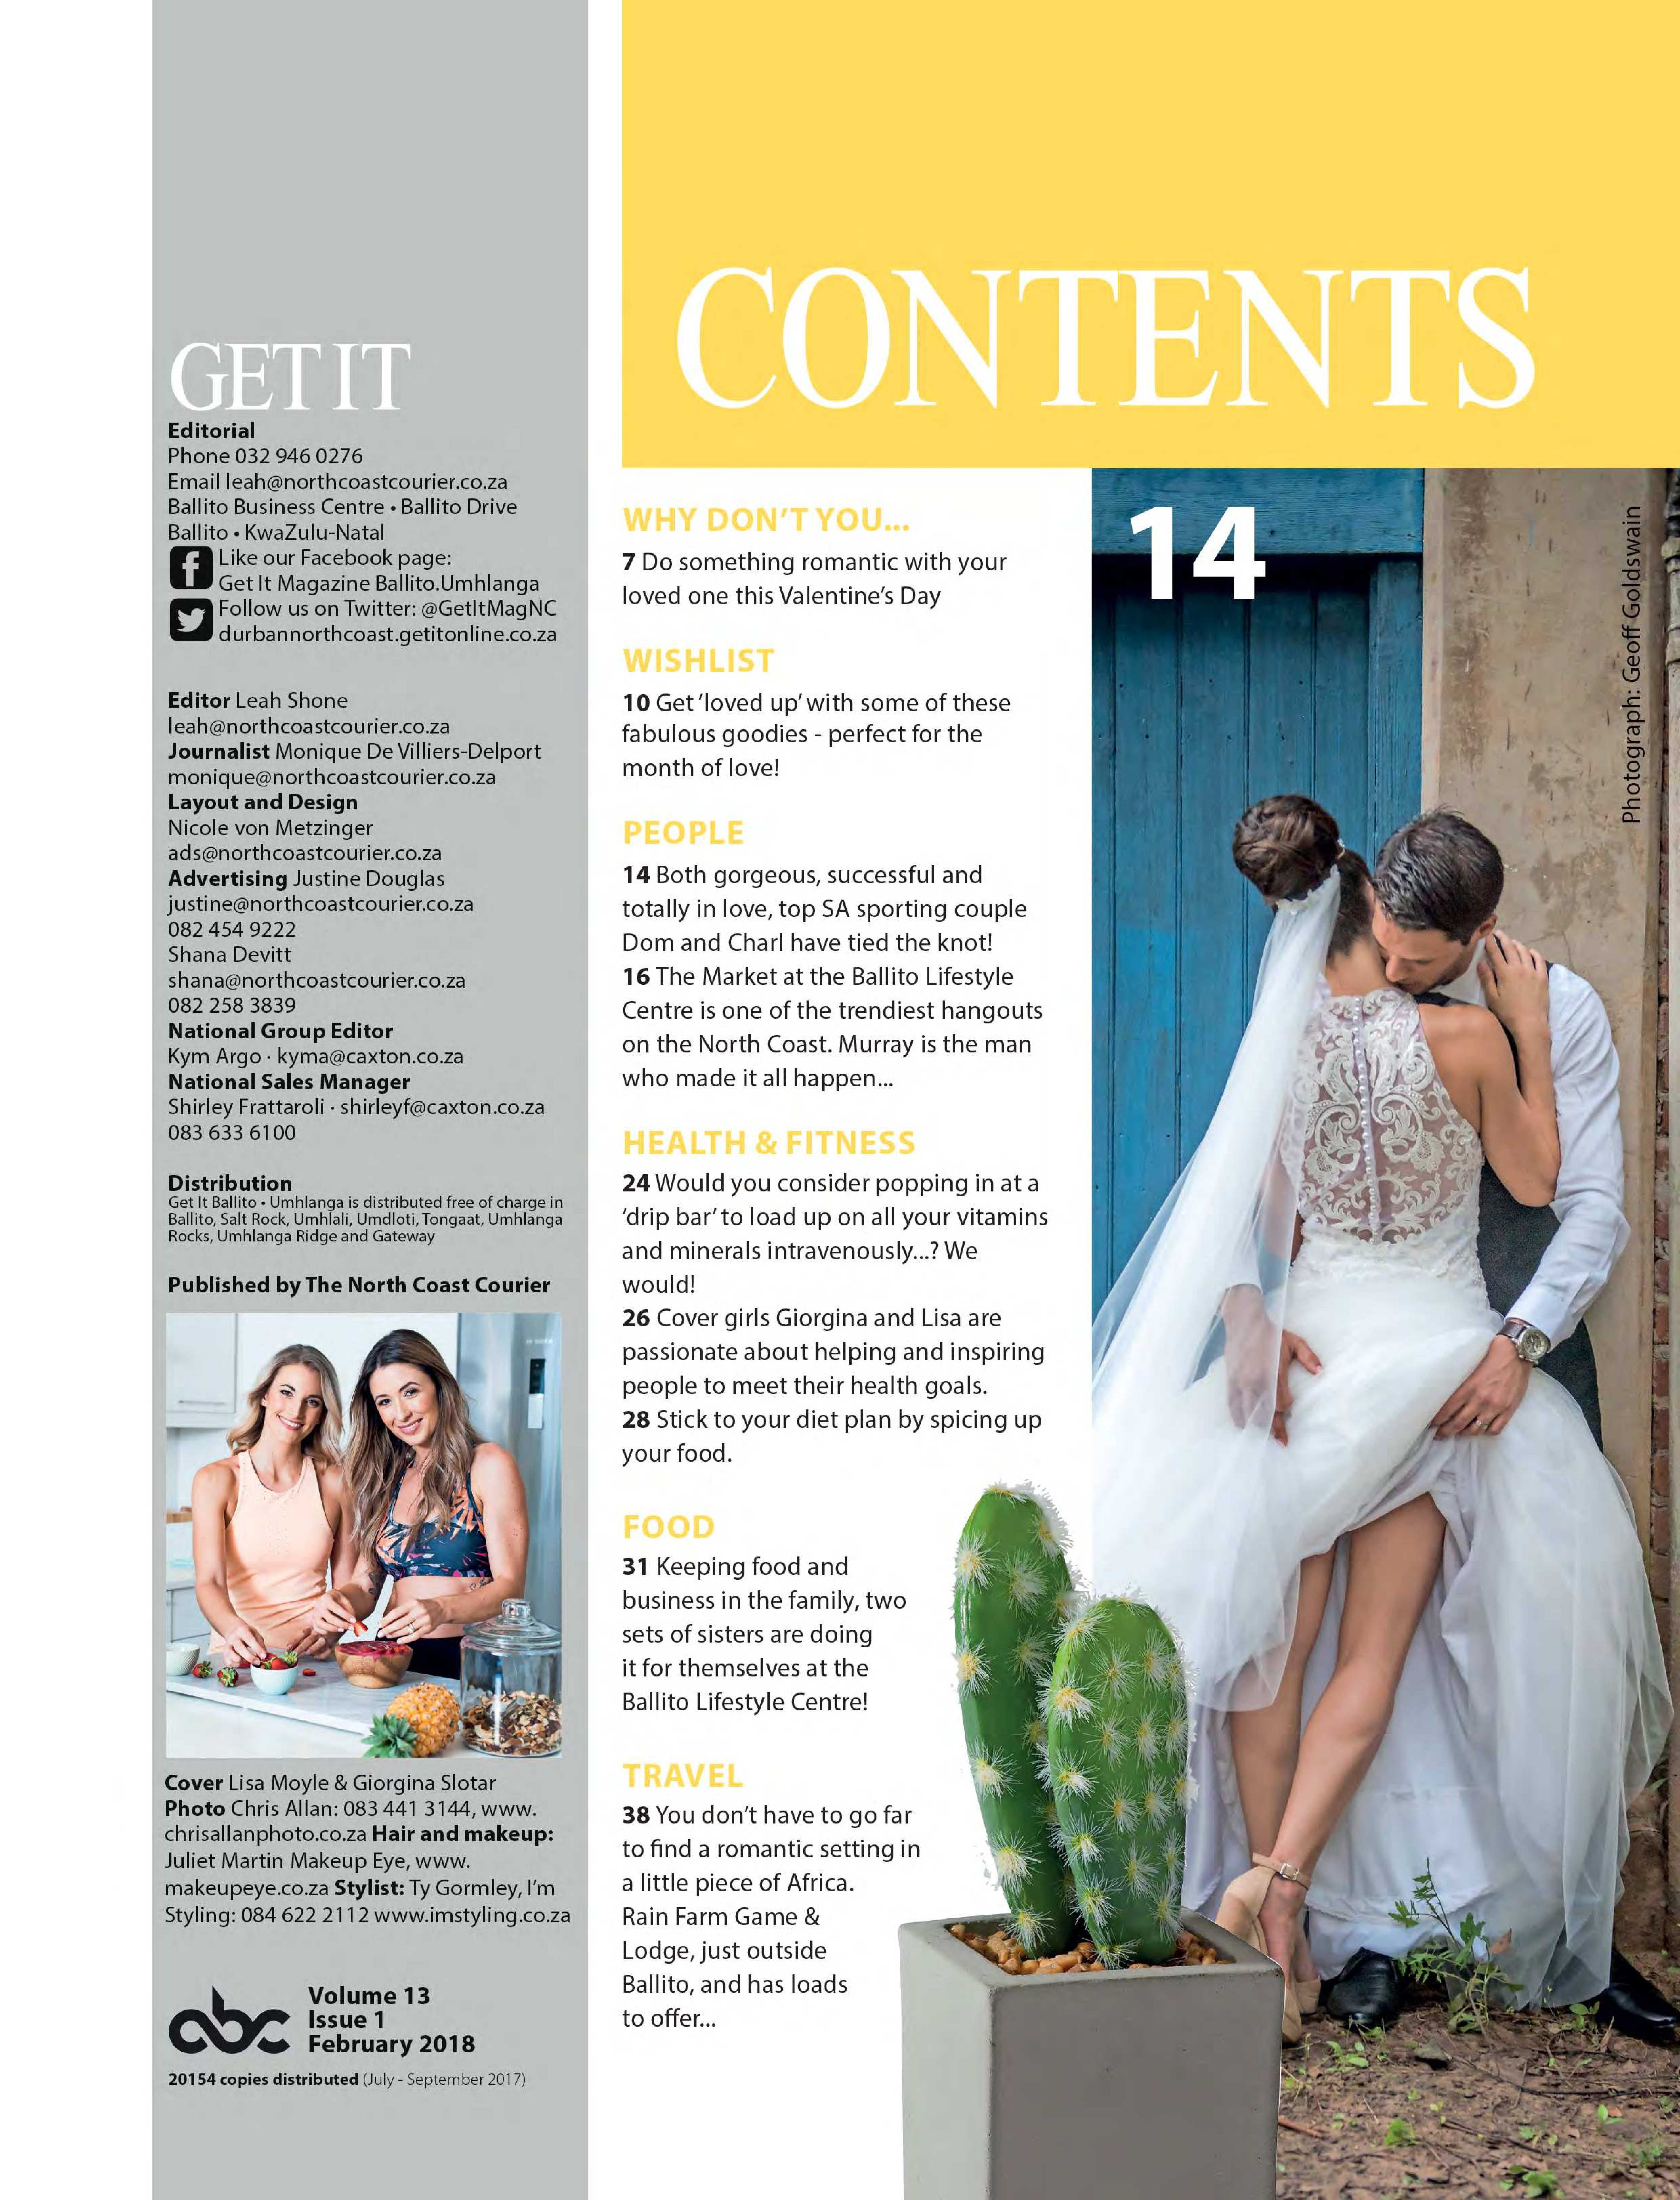 get-magazine-ballitoumhlanga-february-2018-epapers-page-5